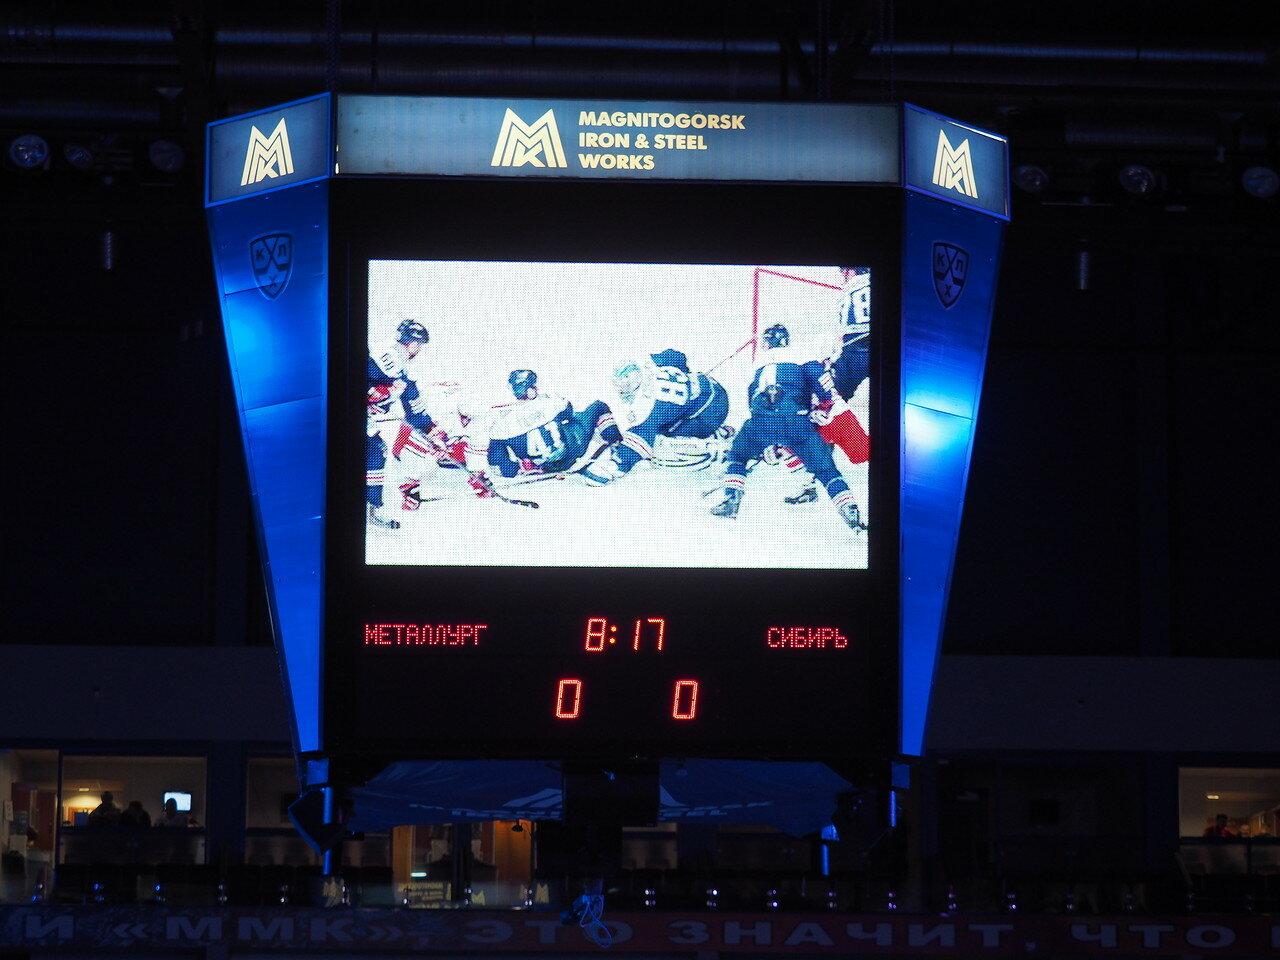 41Плей-офф 2016 Восток 1/2 Металлург - Сибирь 16.03.2016